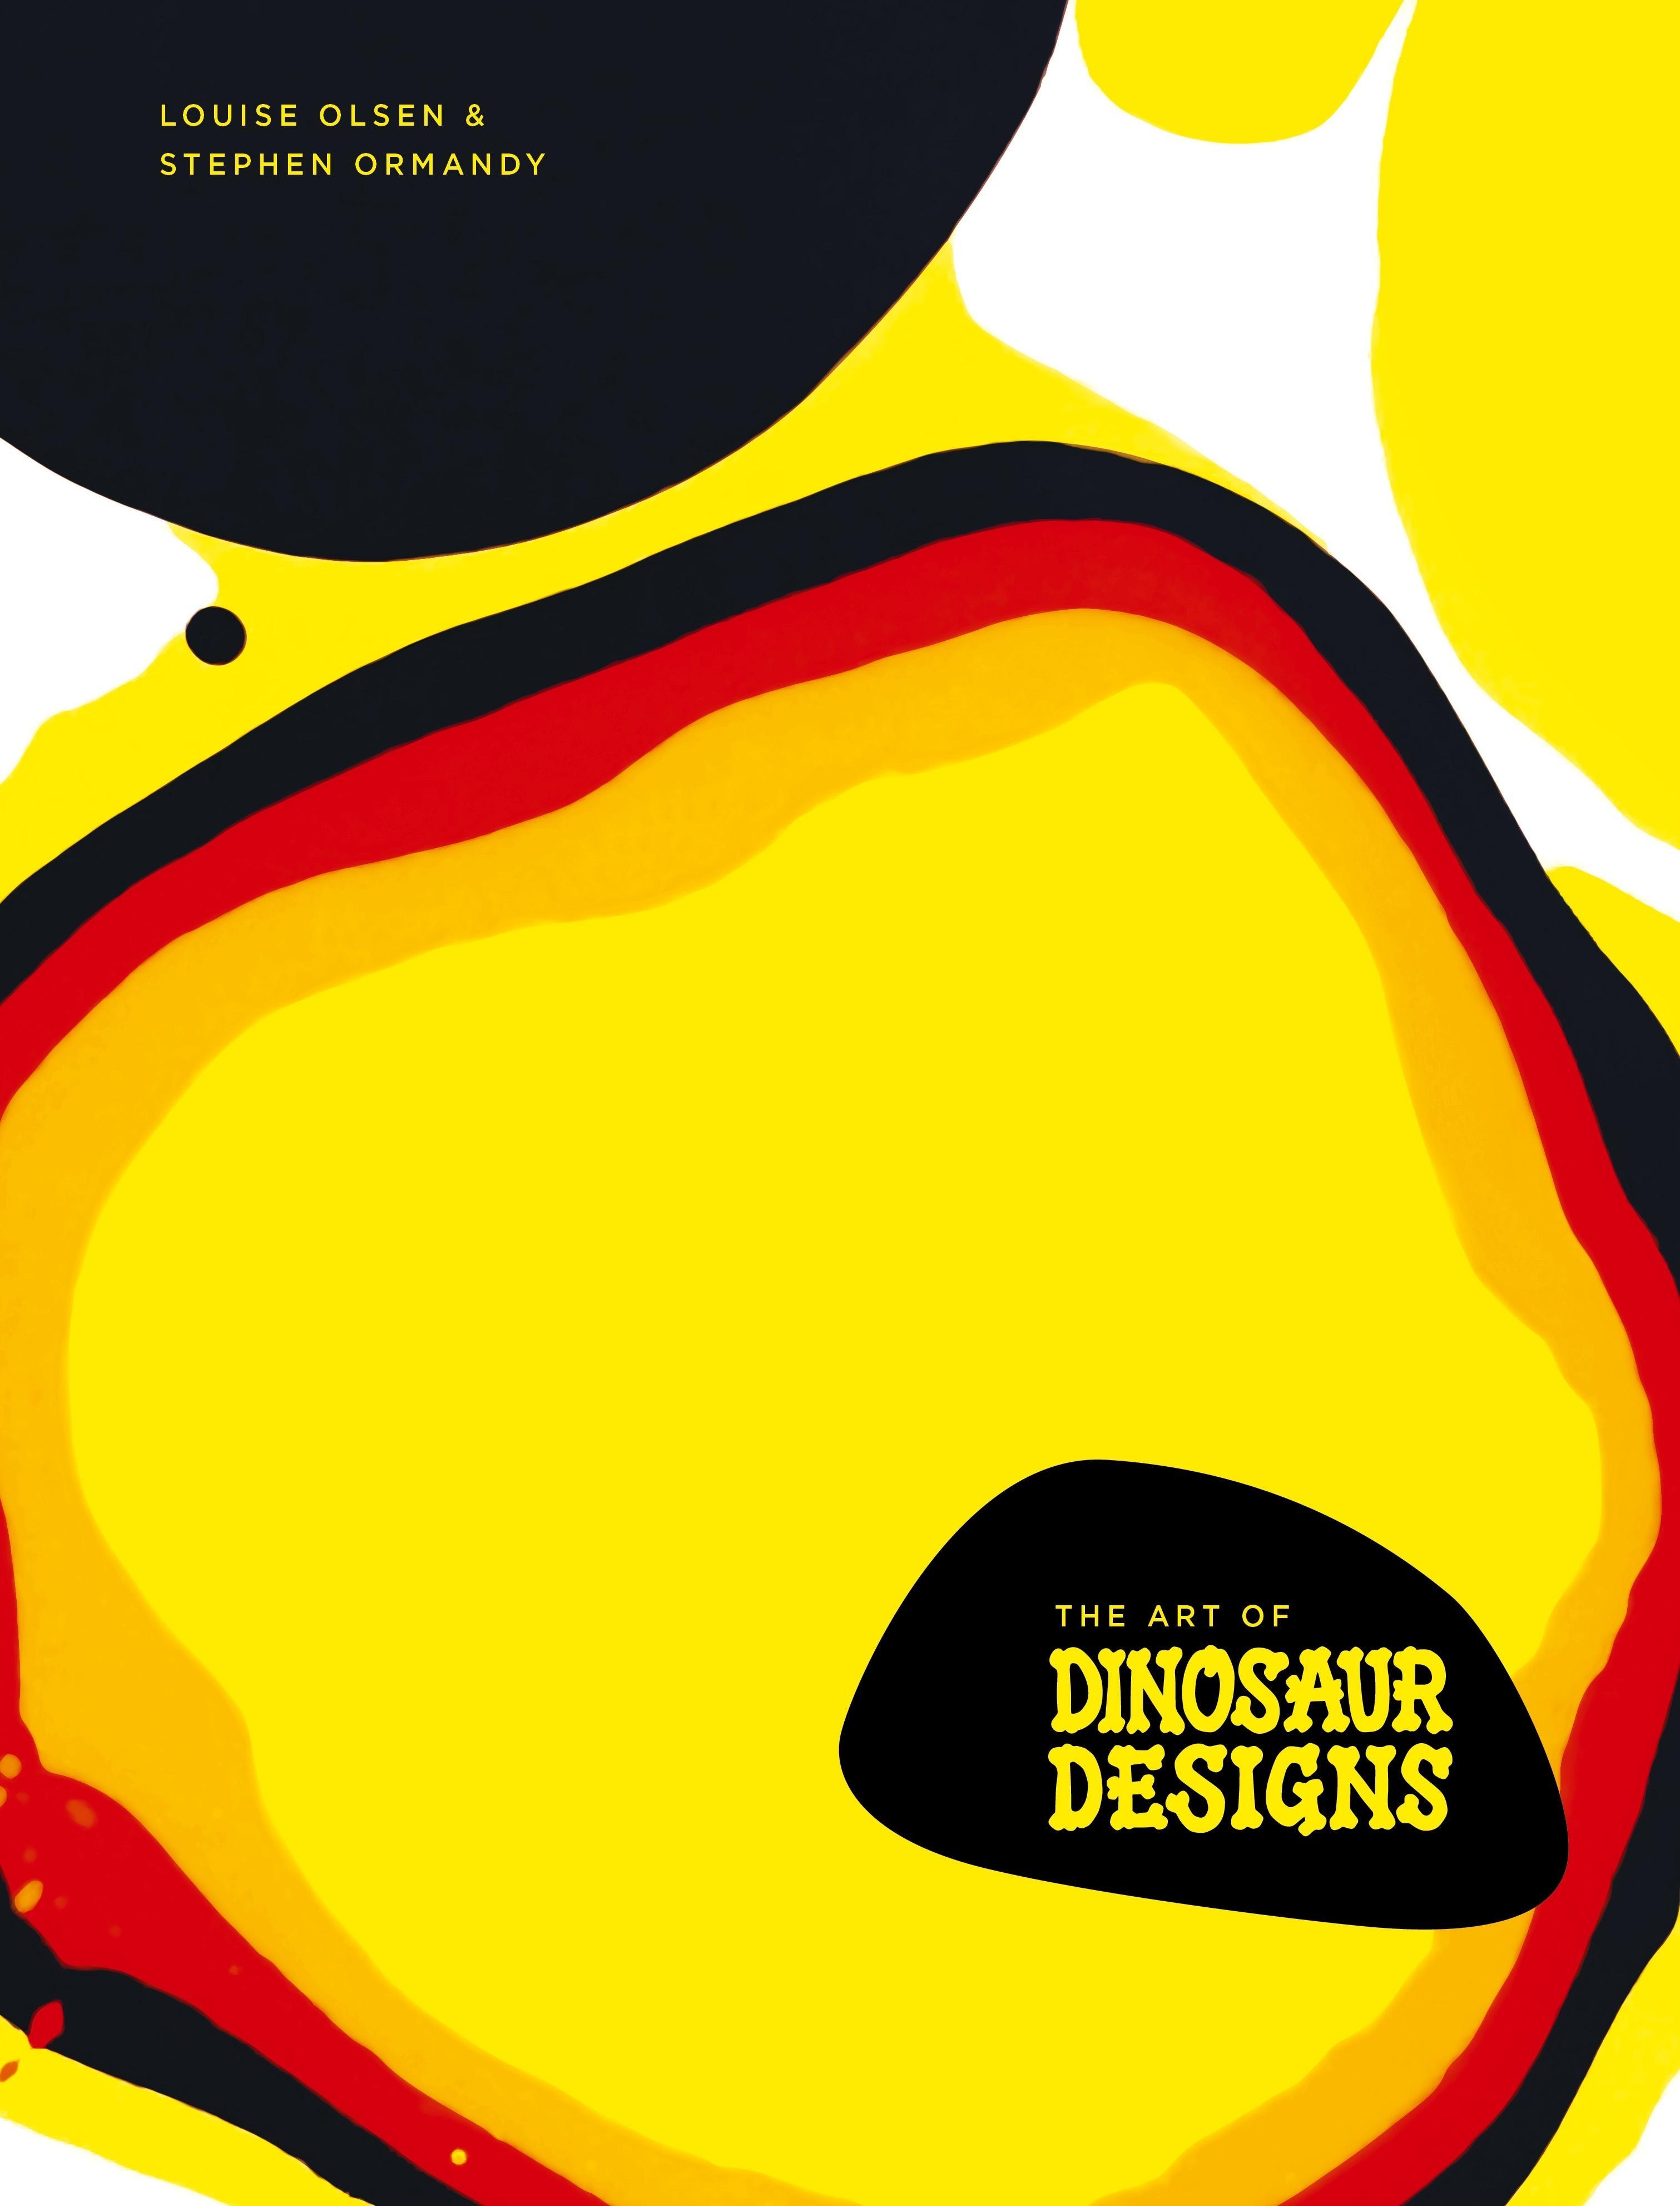 The Art of Dinosaur Designs